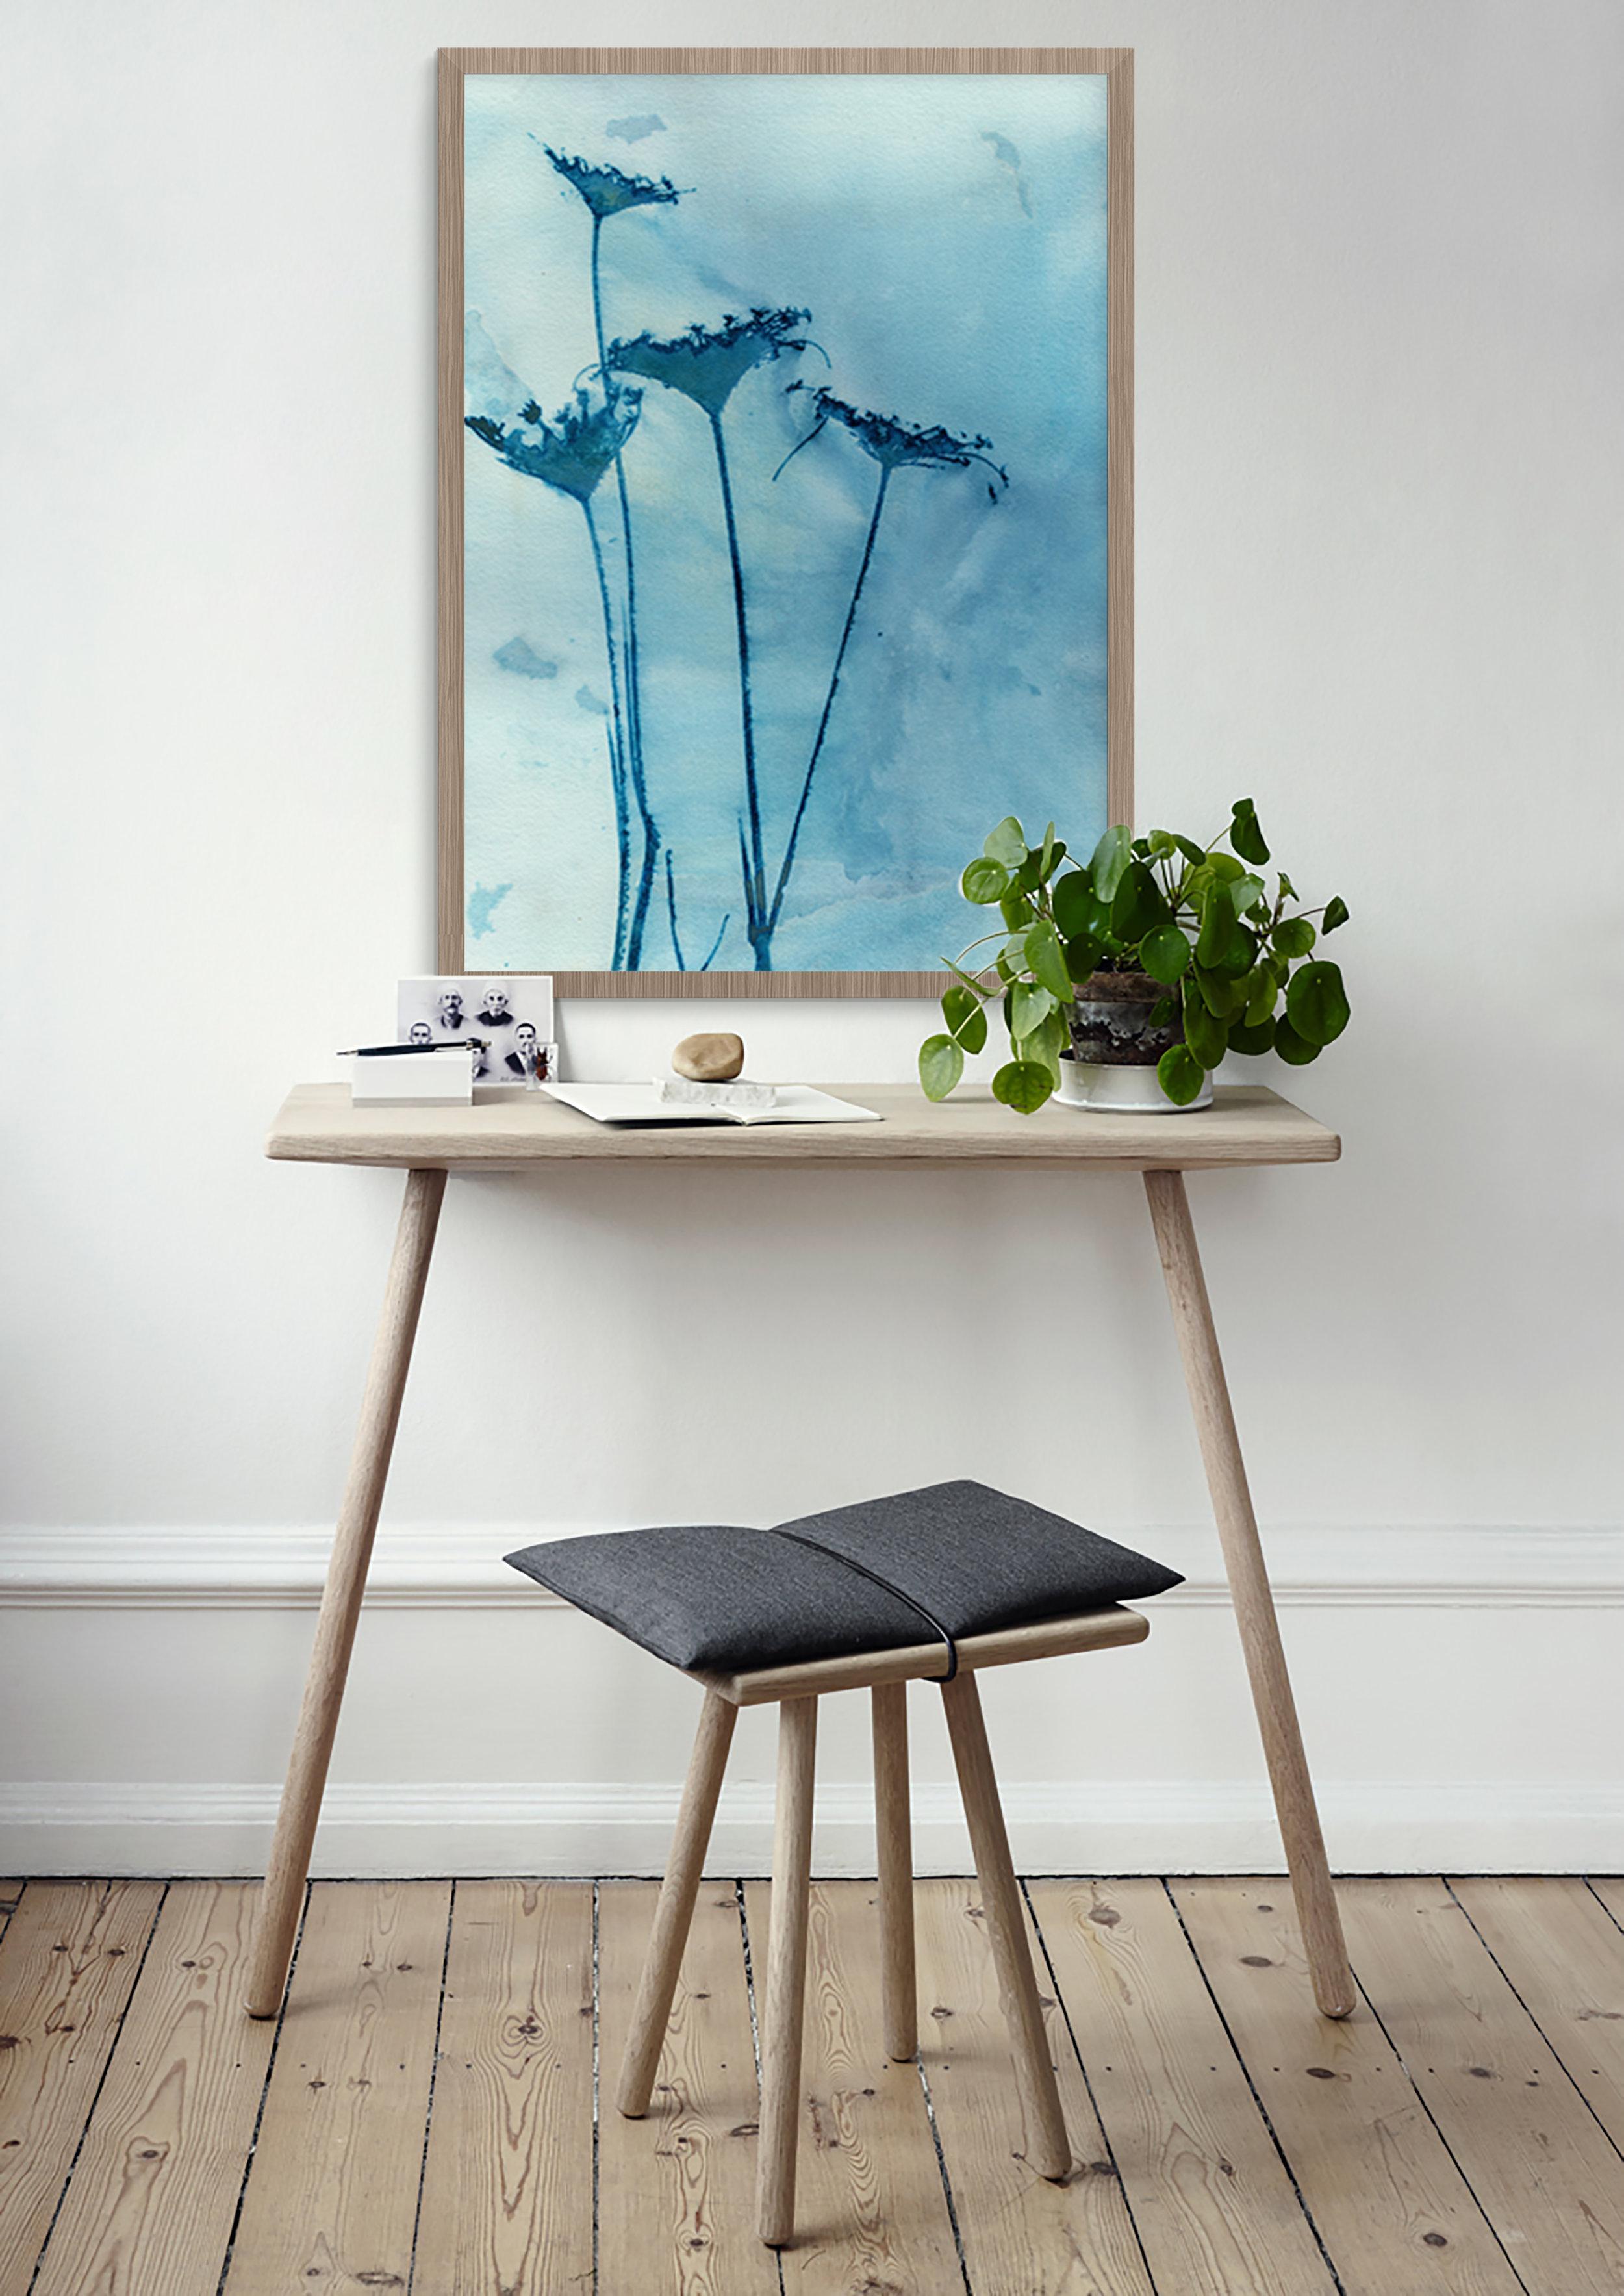 'Blue Anne' cyanotype print by Krista McCurdy